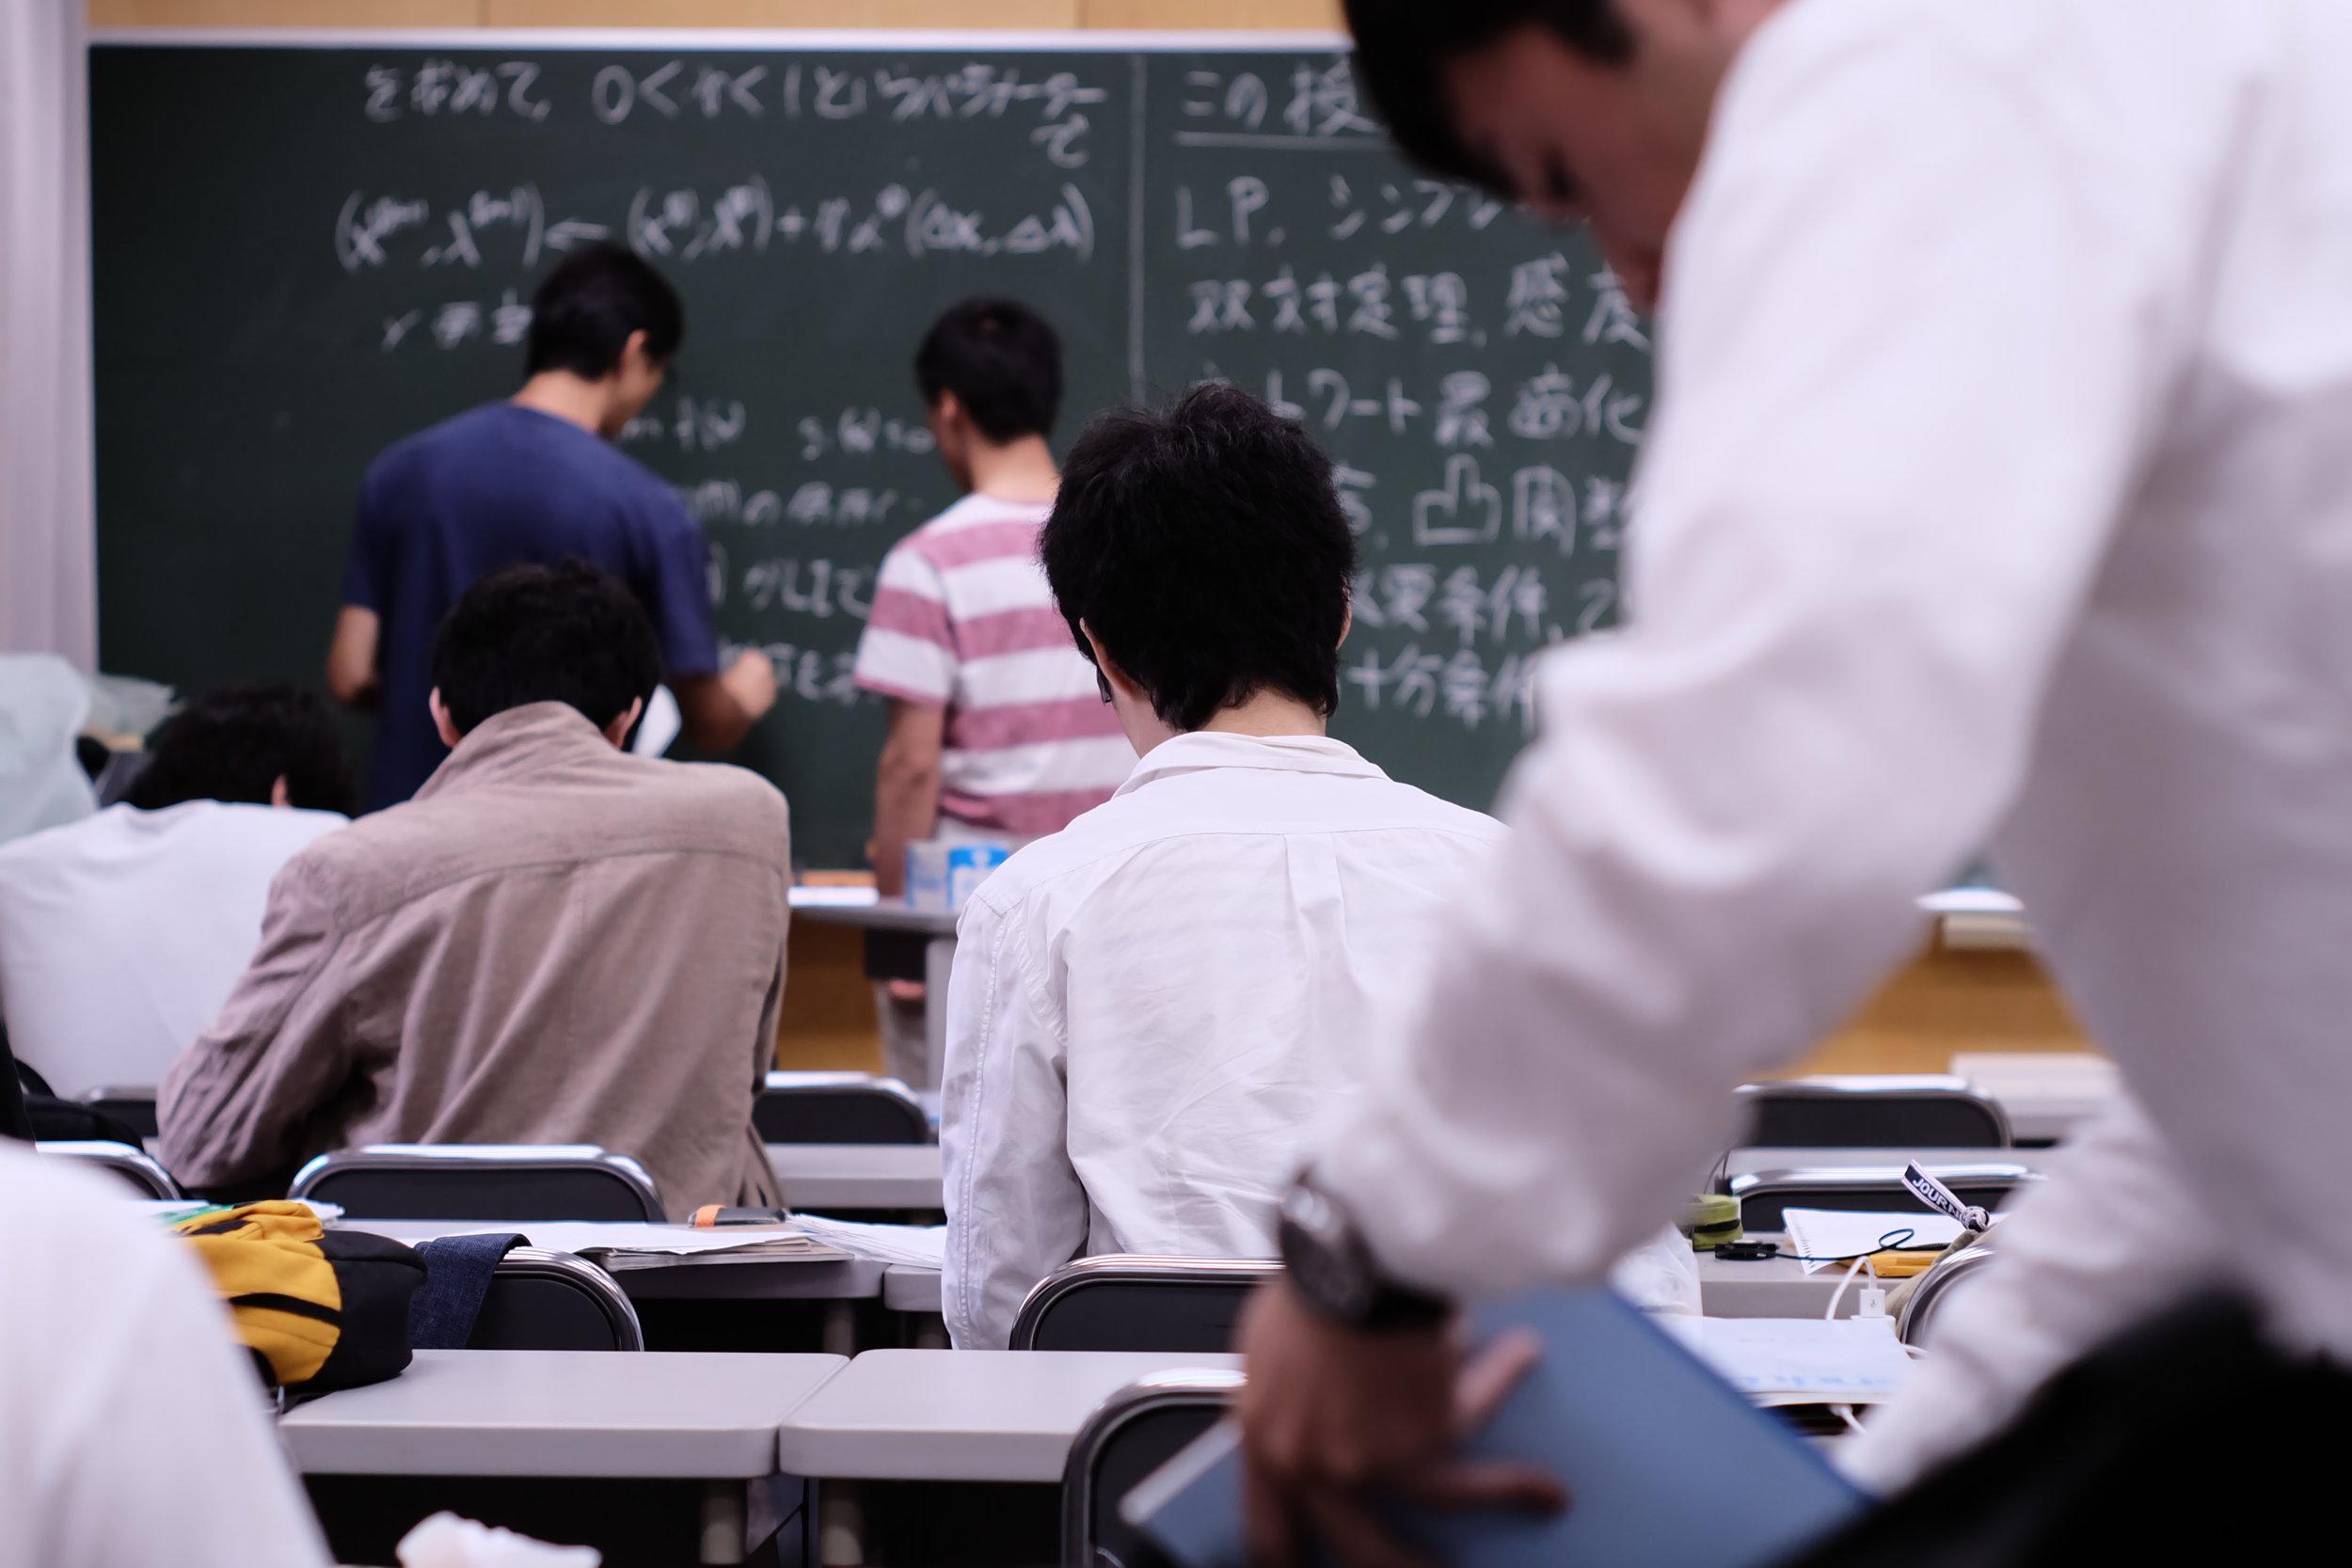 Tertarik berkuliah di Tokodai? - Cek link berikut untuk informasi yang berkaitan dengan proses menjadi mahasiswa Tokodai.